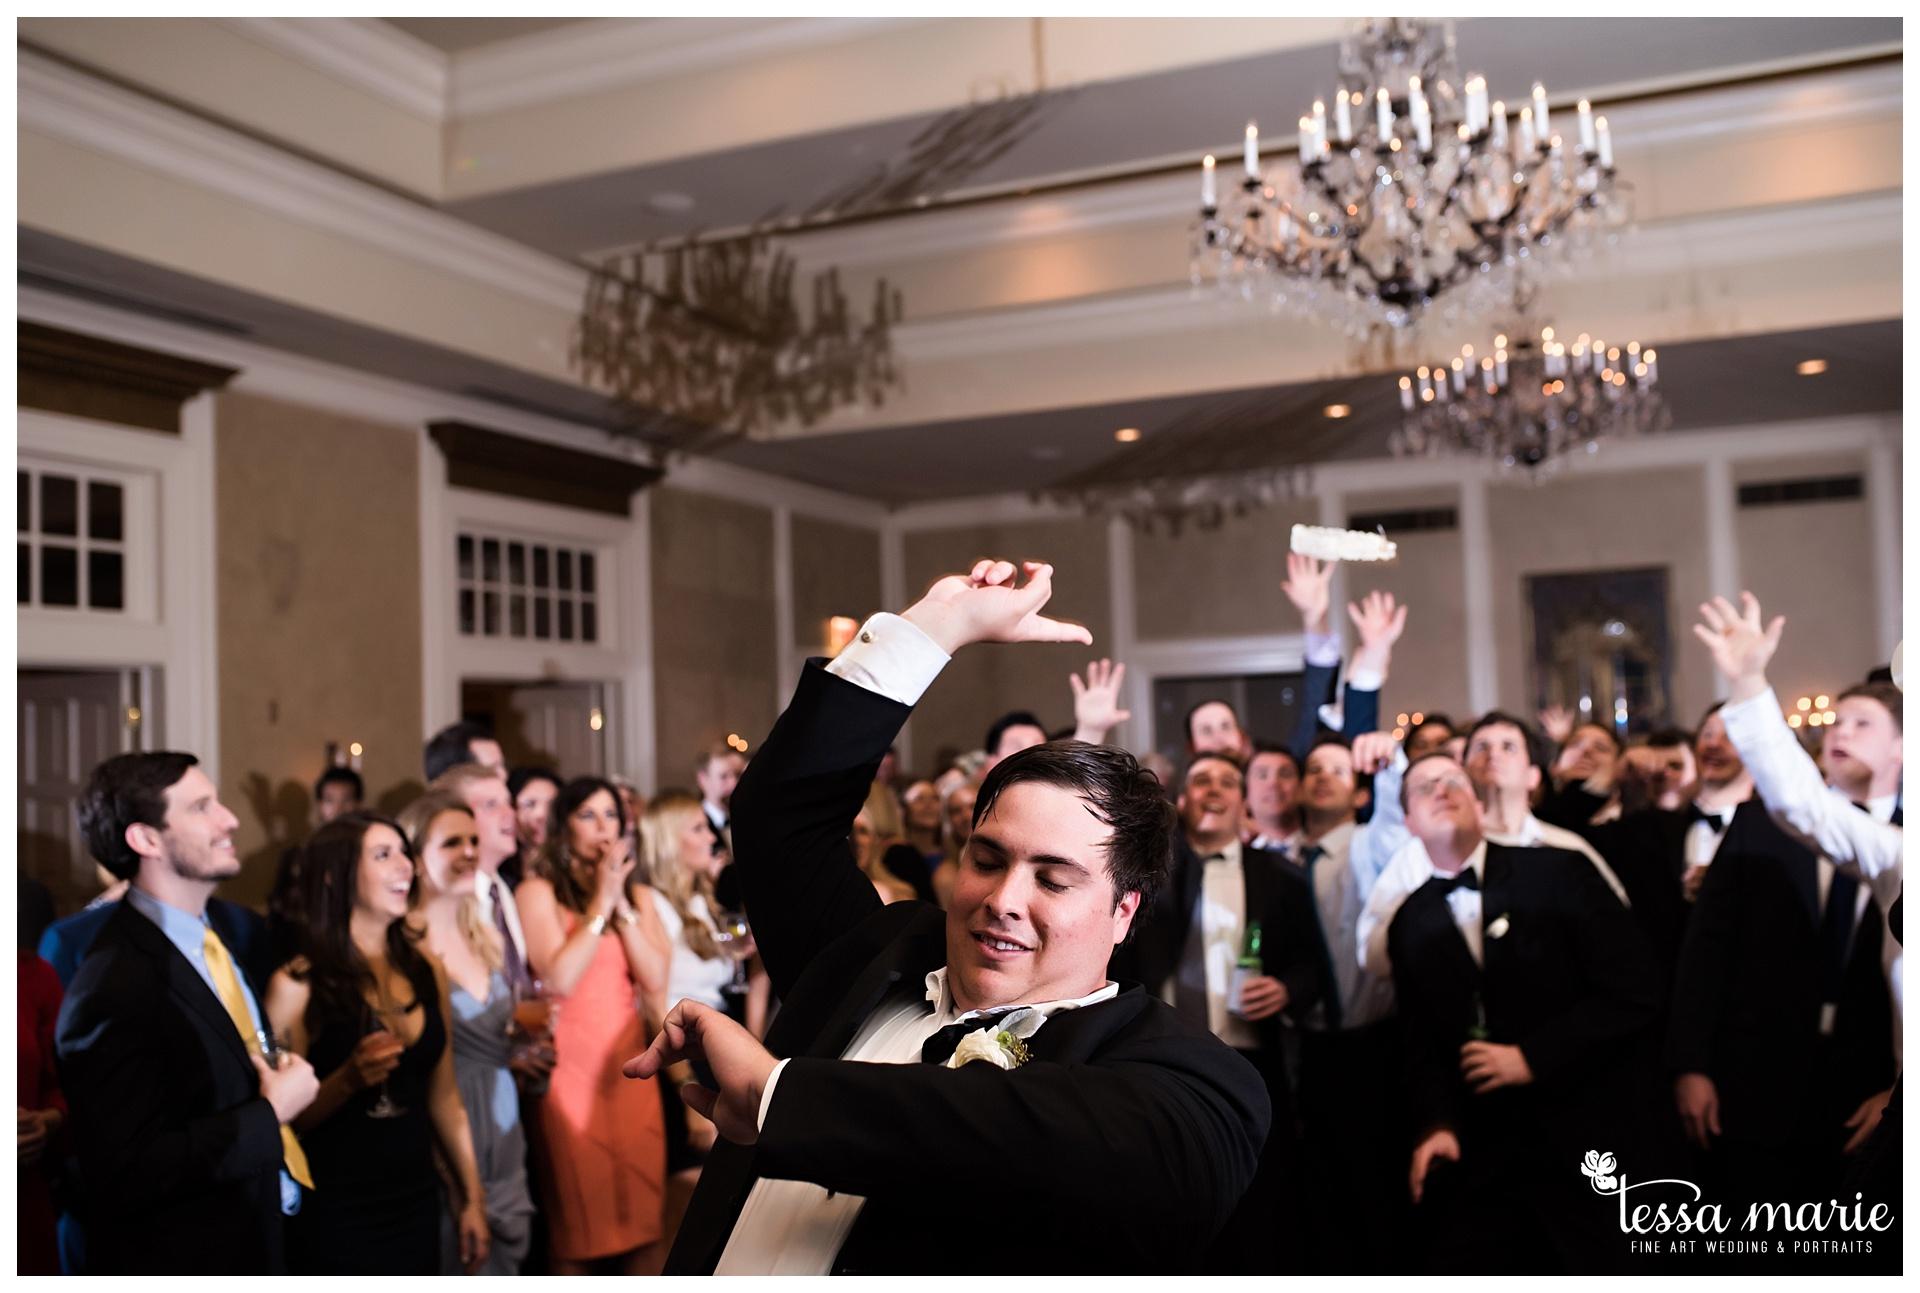 tessa_marie_weddings_legacy_story_focused_wedding_pictures_atlanta_wedding_photographer_0161